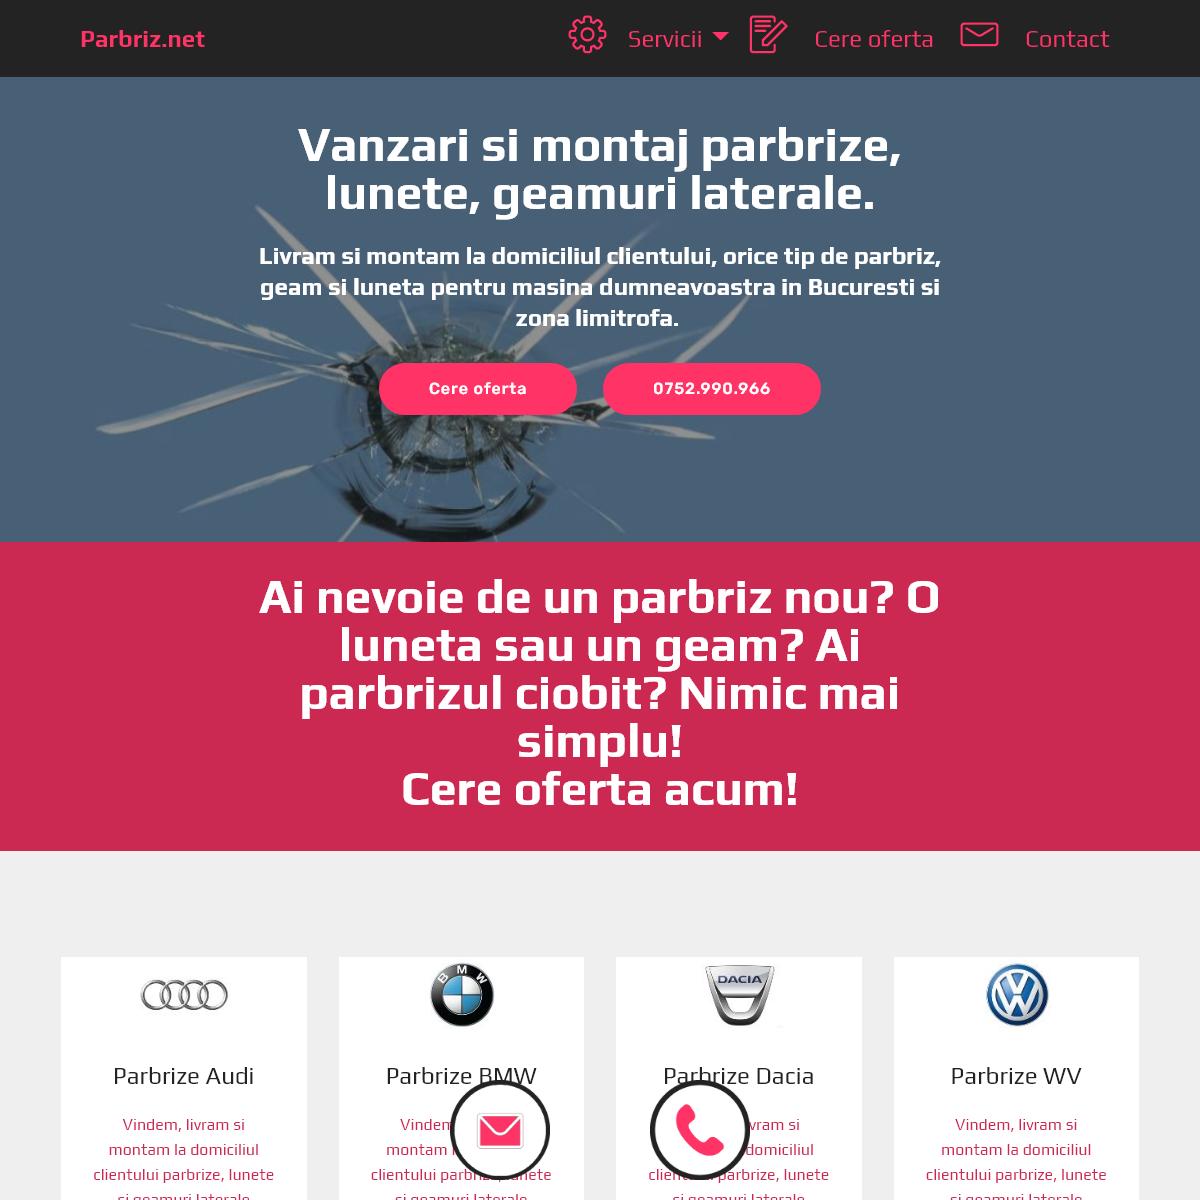 Parbriz.net